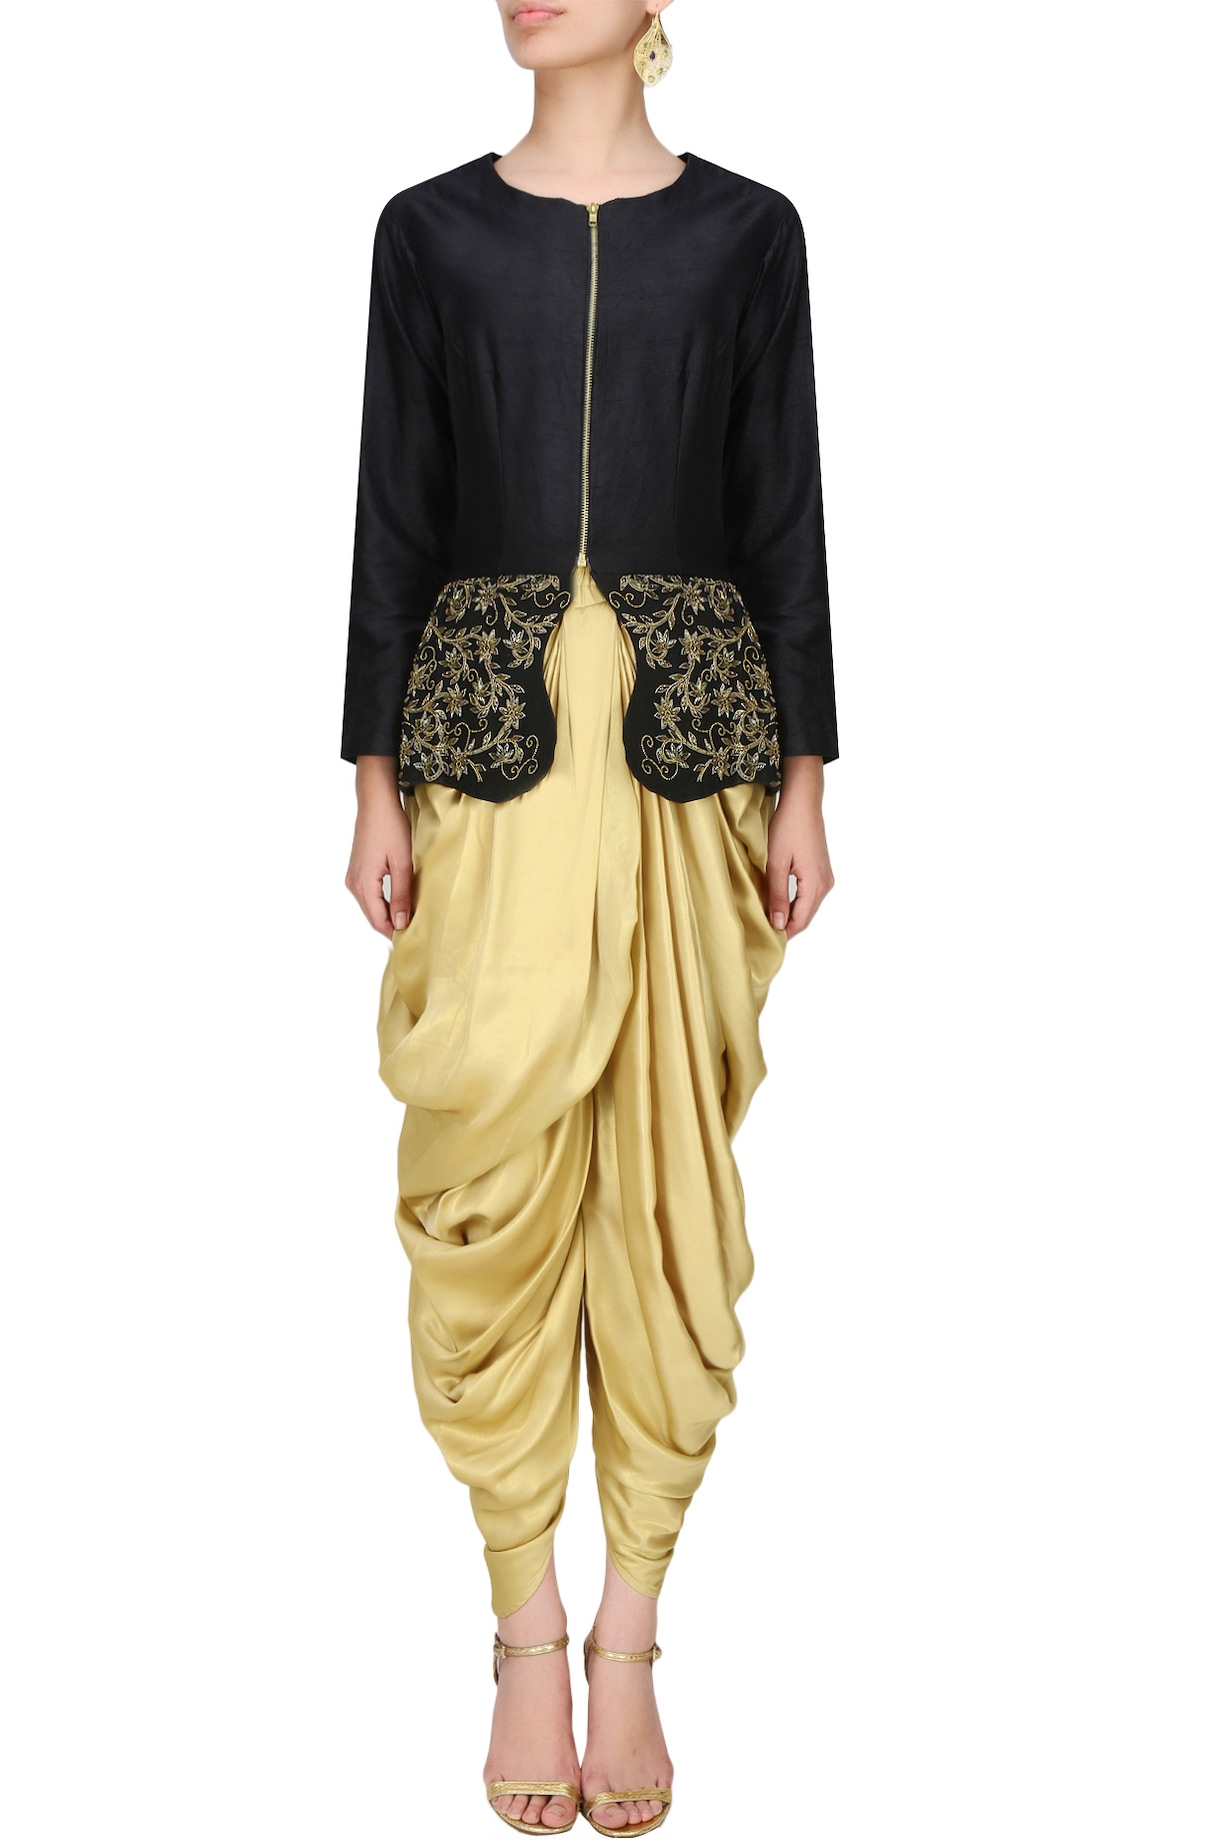 Tanya Patni Pants